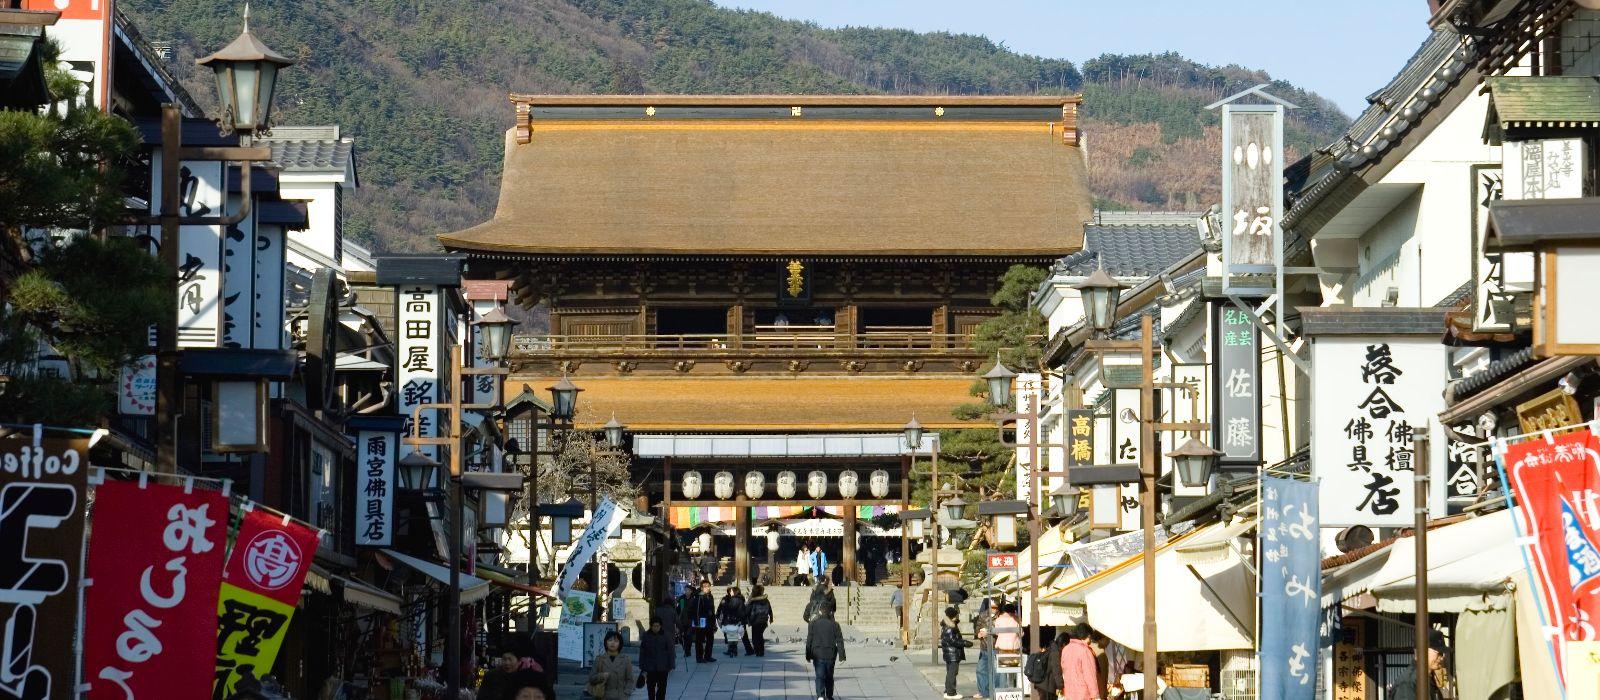 Destination Nagano Japan